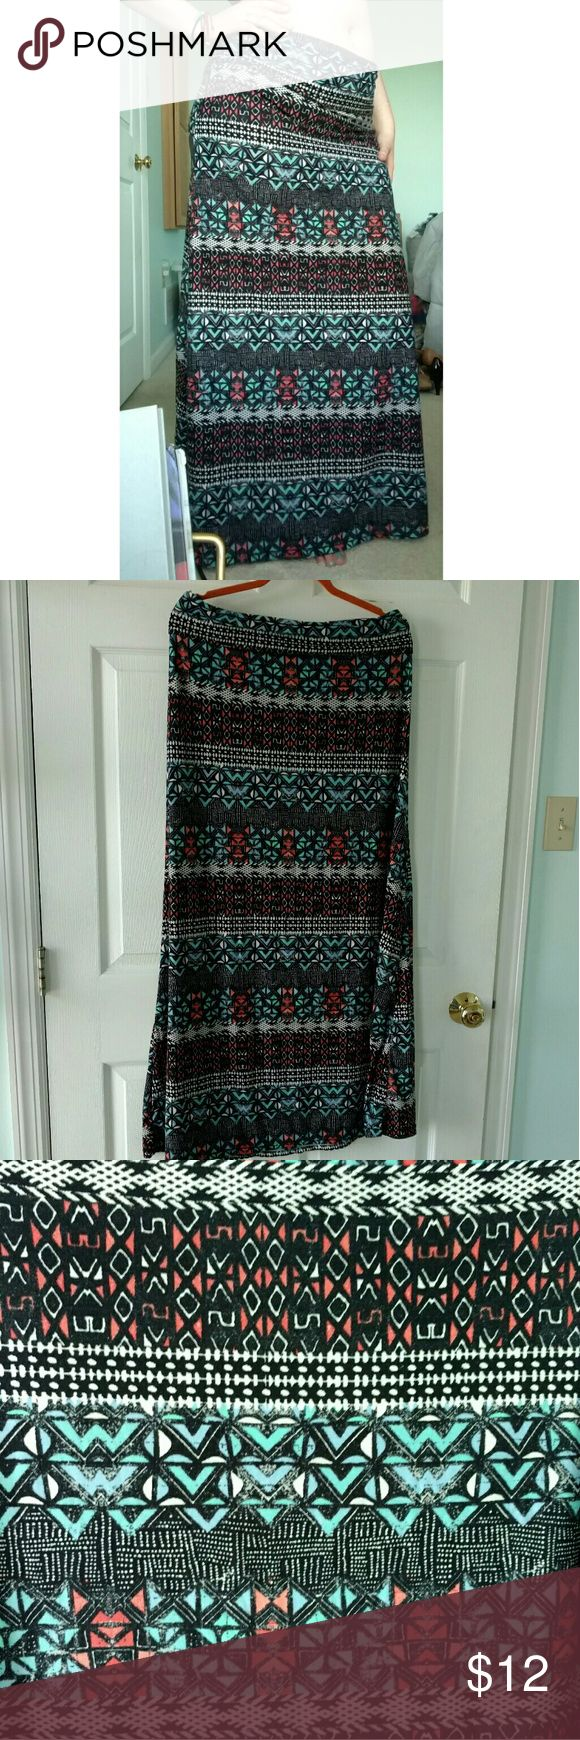 Tribal Maxi Skirt Super stretchy and comfortable! Hot Kiss Skirts Maxi